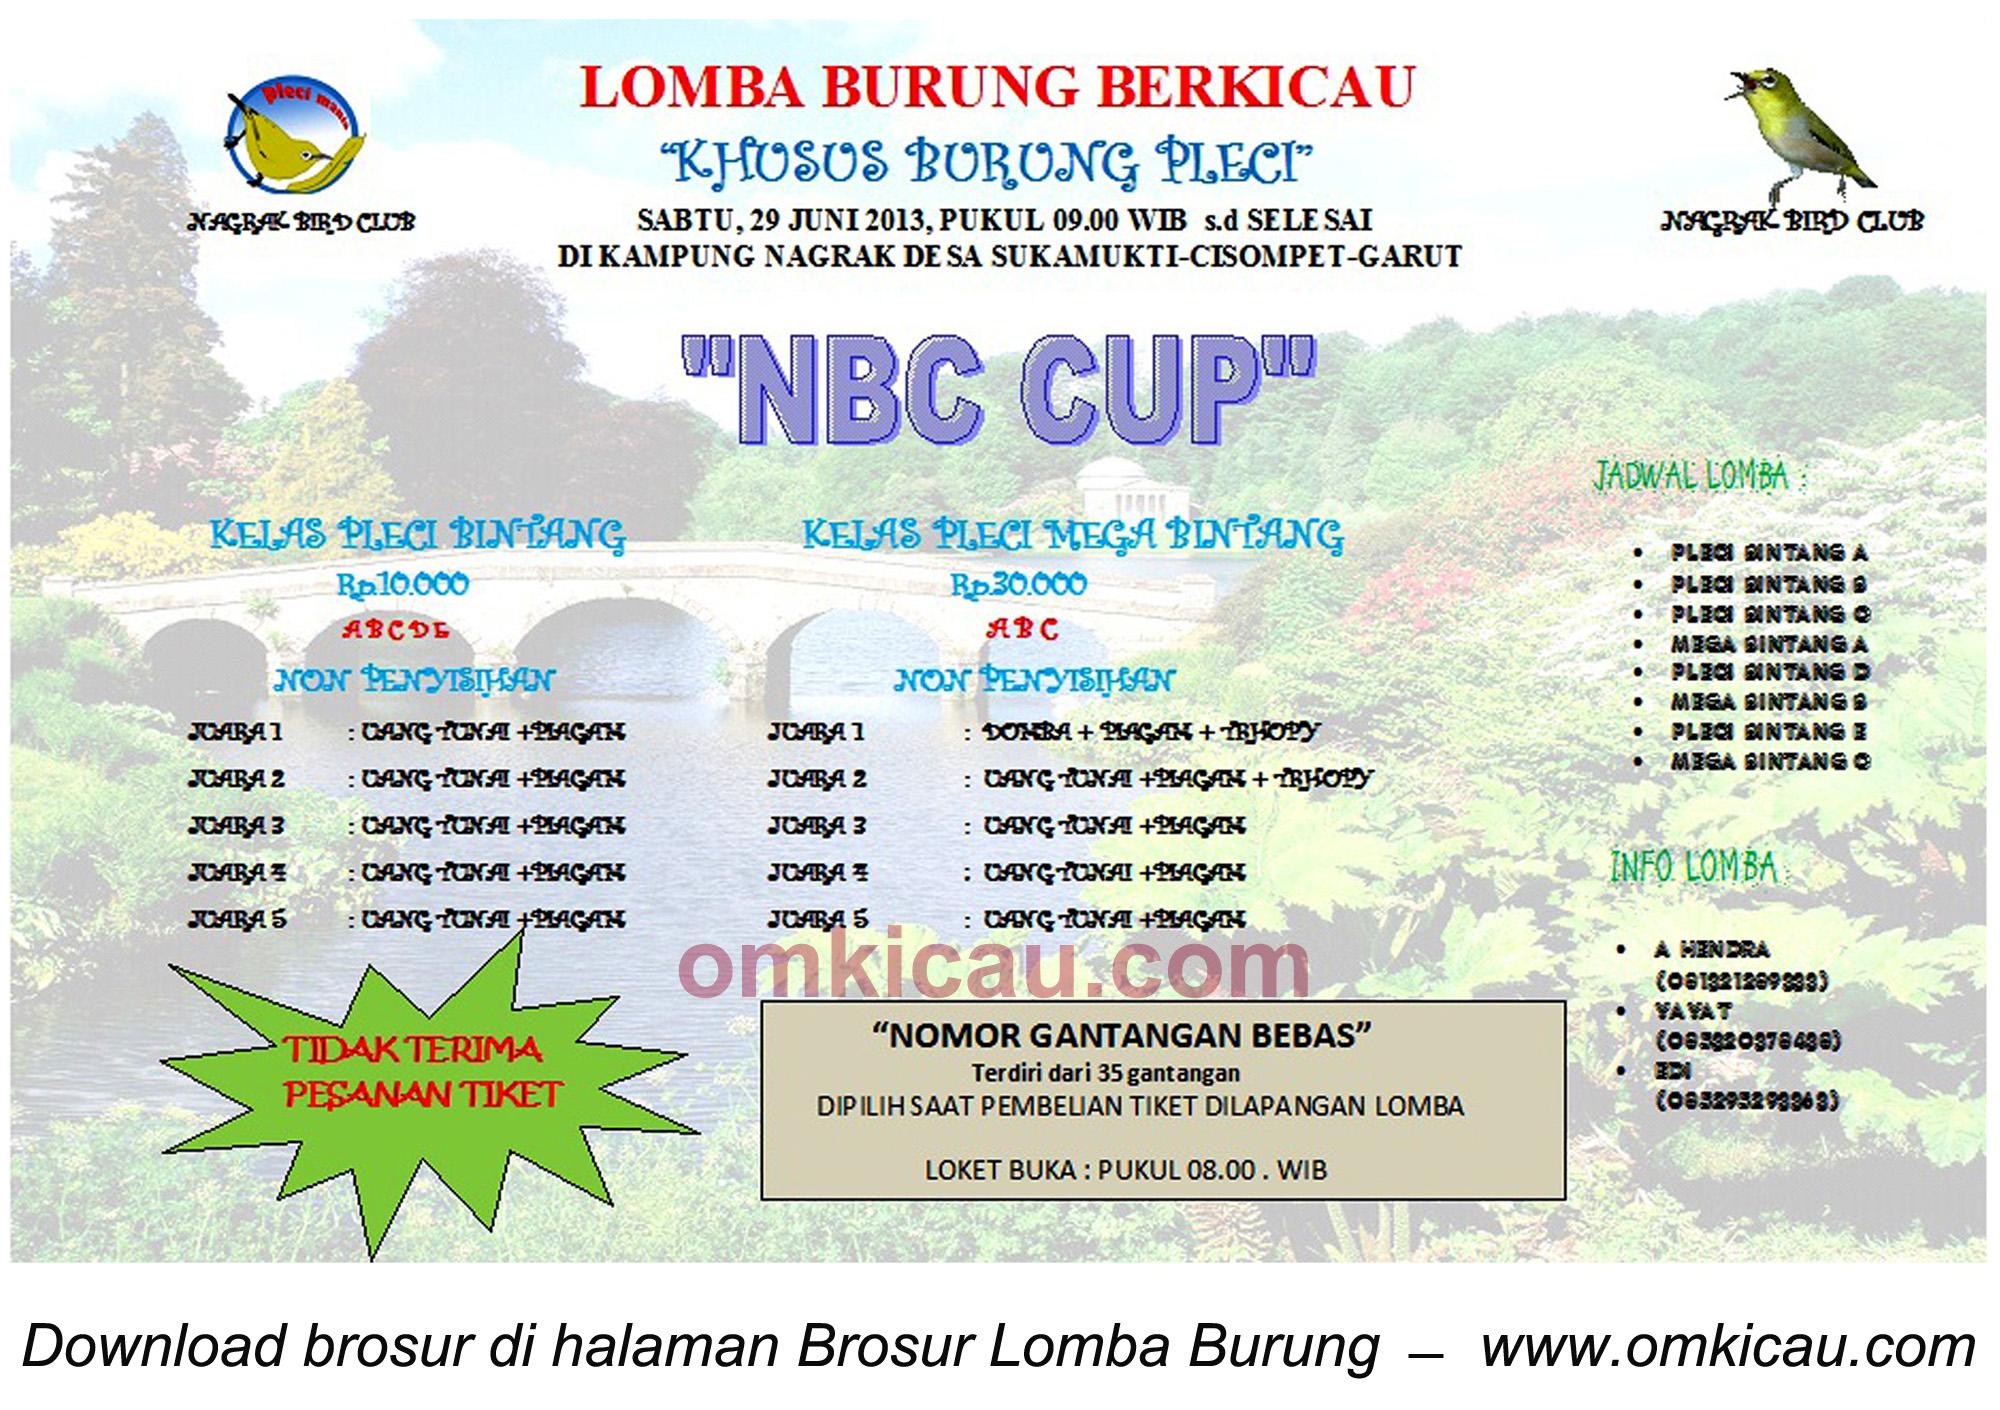 Brosur Lomba Burung Pleci NBC Cup - Garut - 29 Juni 2013